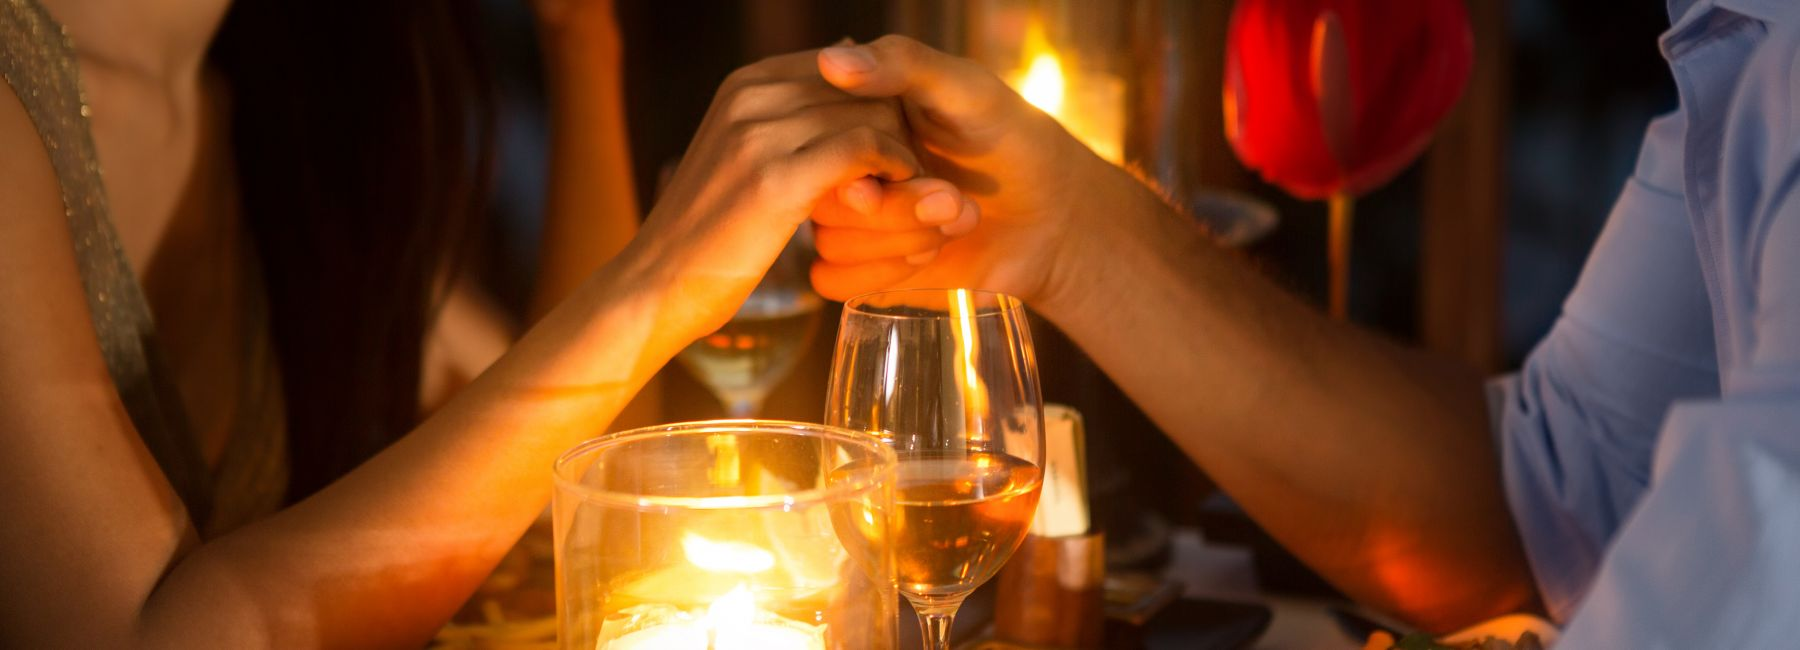 Couple Dinner Date